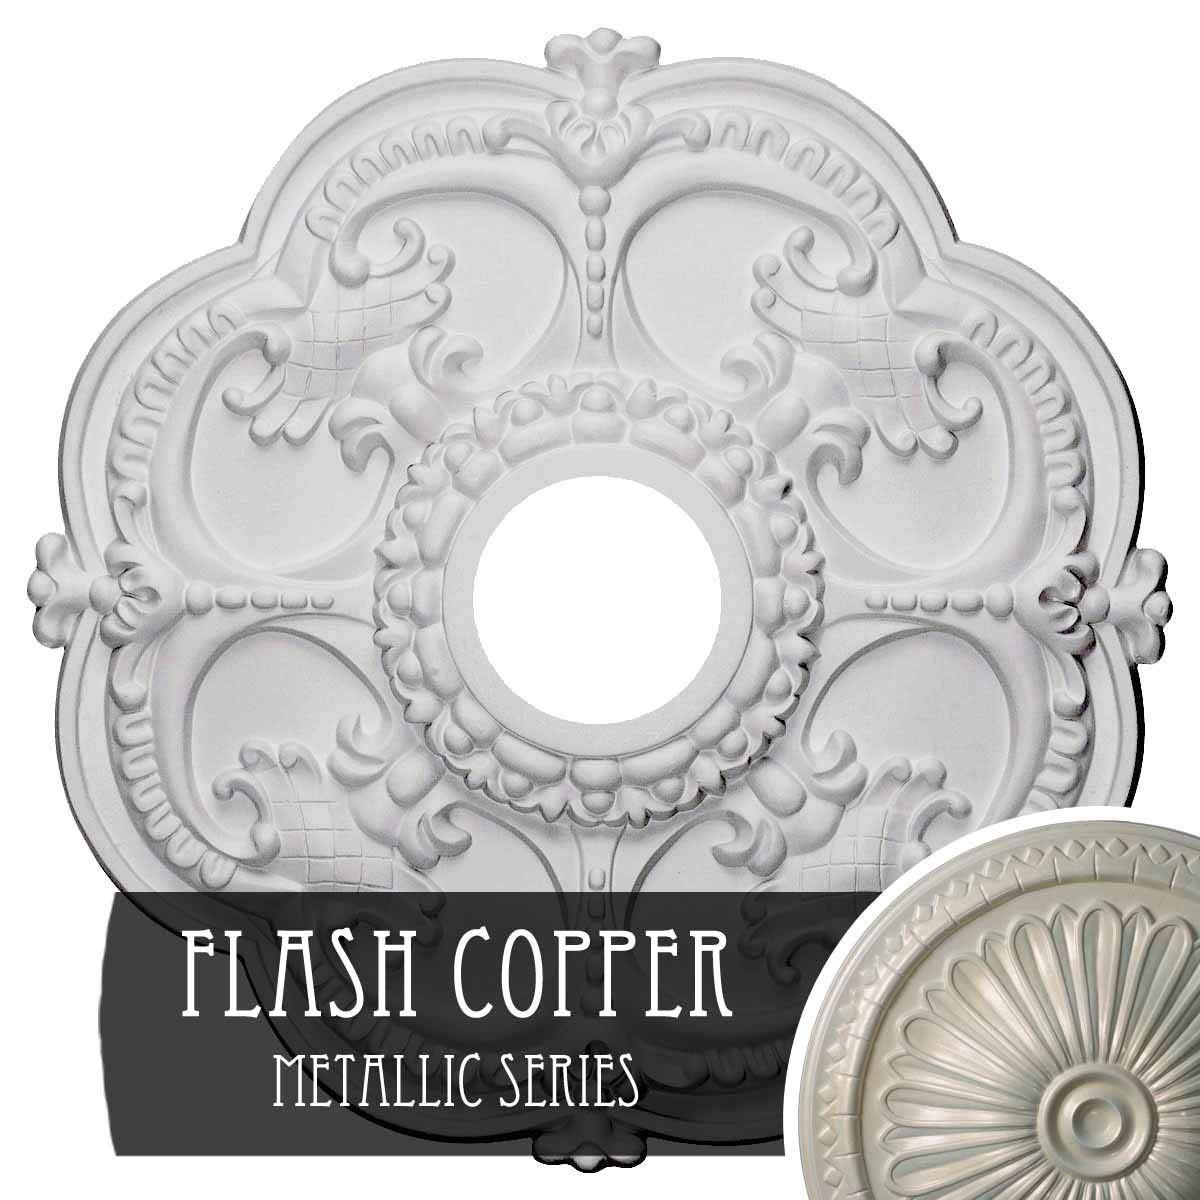 Flash Copper Ekena Millwork CM17ROUWF redherham Ceiling Medallion, 18 OD x 3 1 2 ID x 1 1 2 P, Ultra Pure White